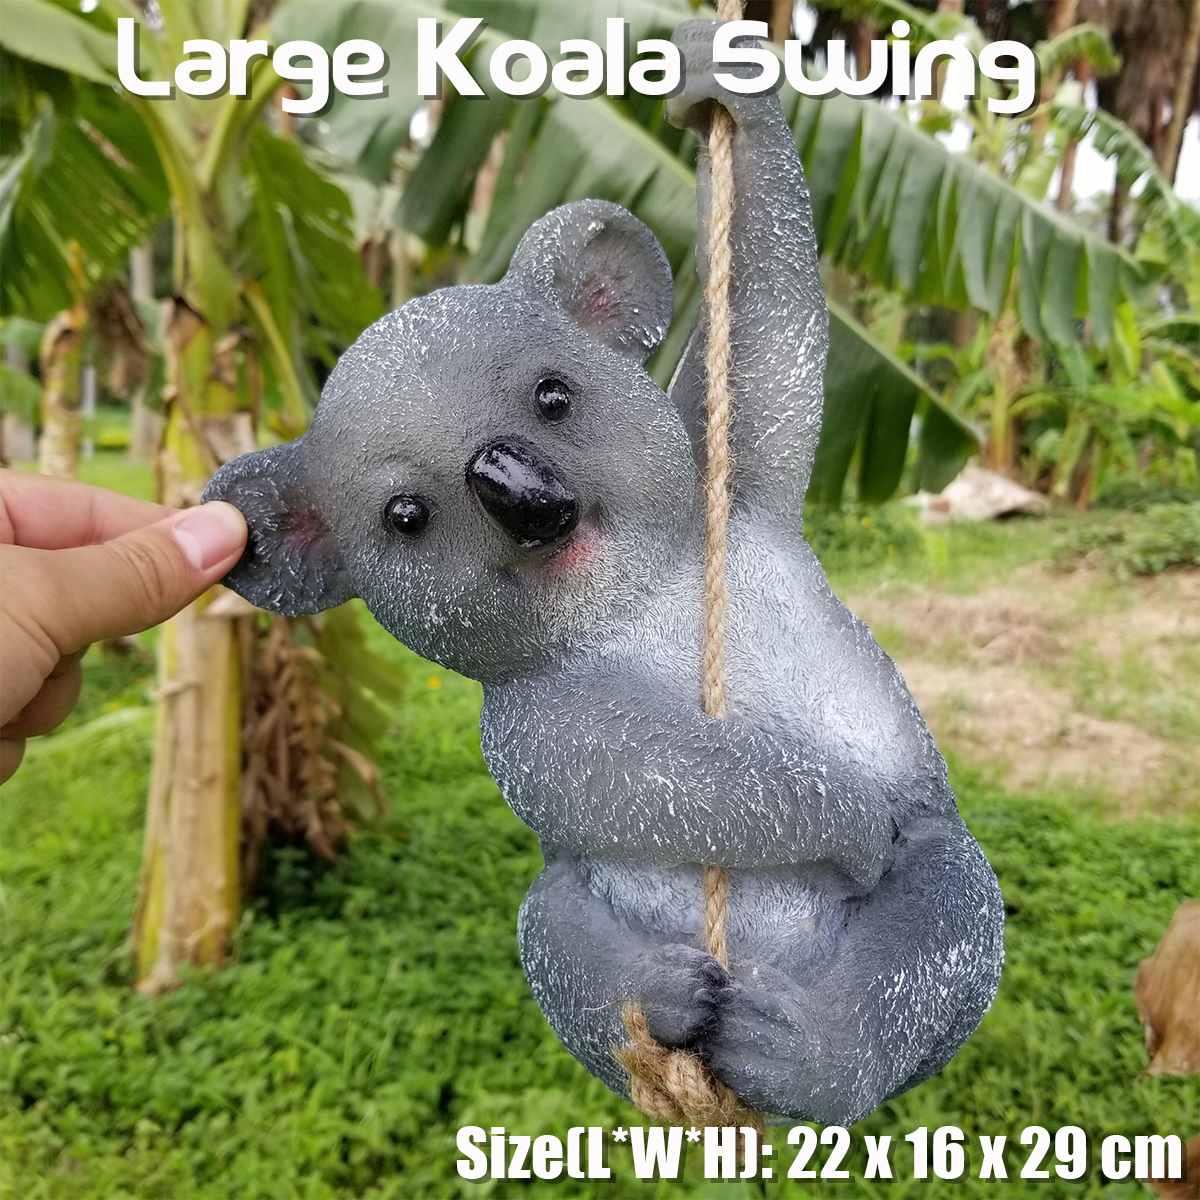 1Pcs Garden Yard Decoration Simulation Koala Swing Statue Animals Sculpture Resin Crafts Home Decoration Ornament